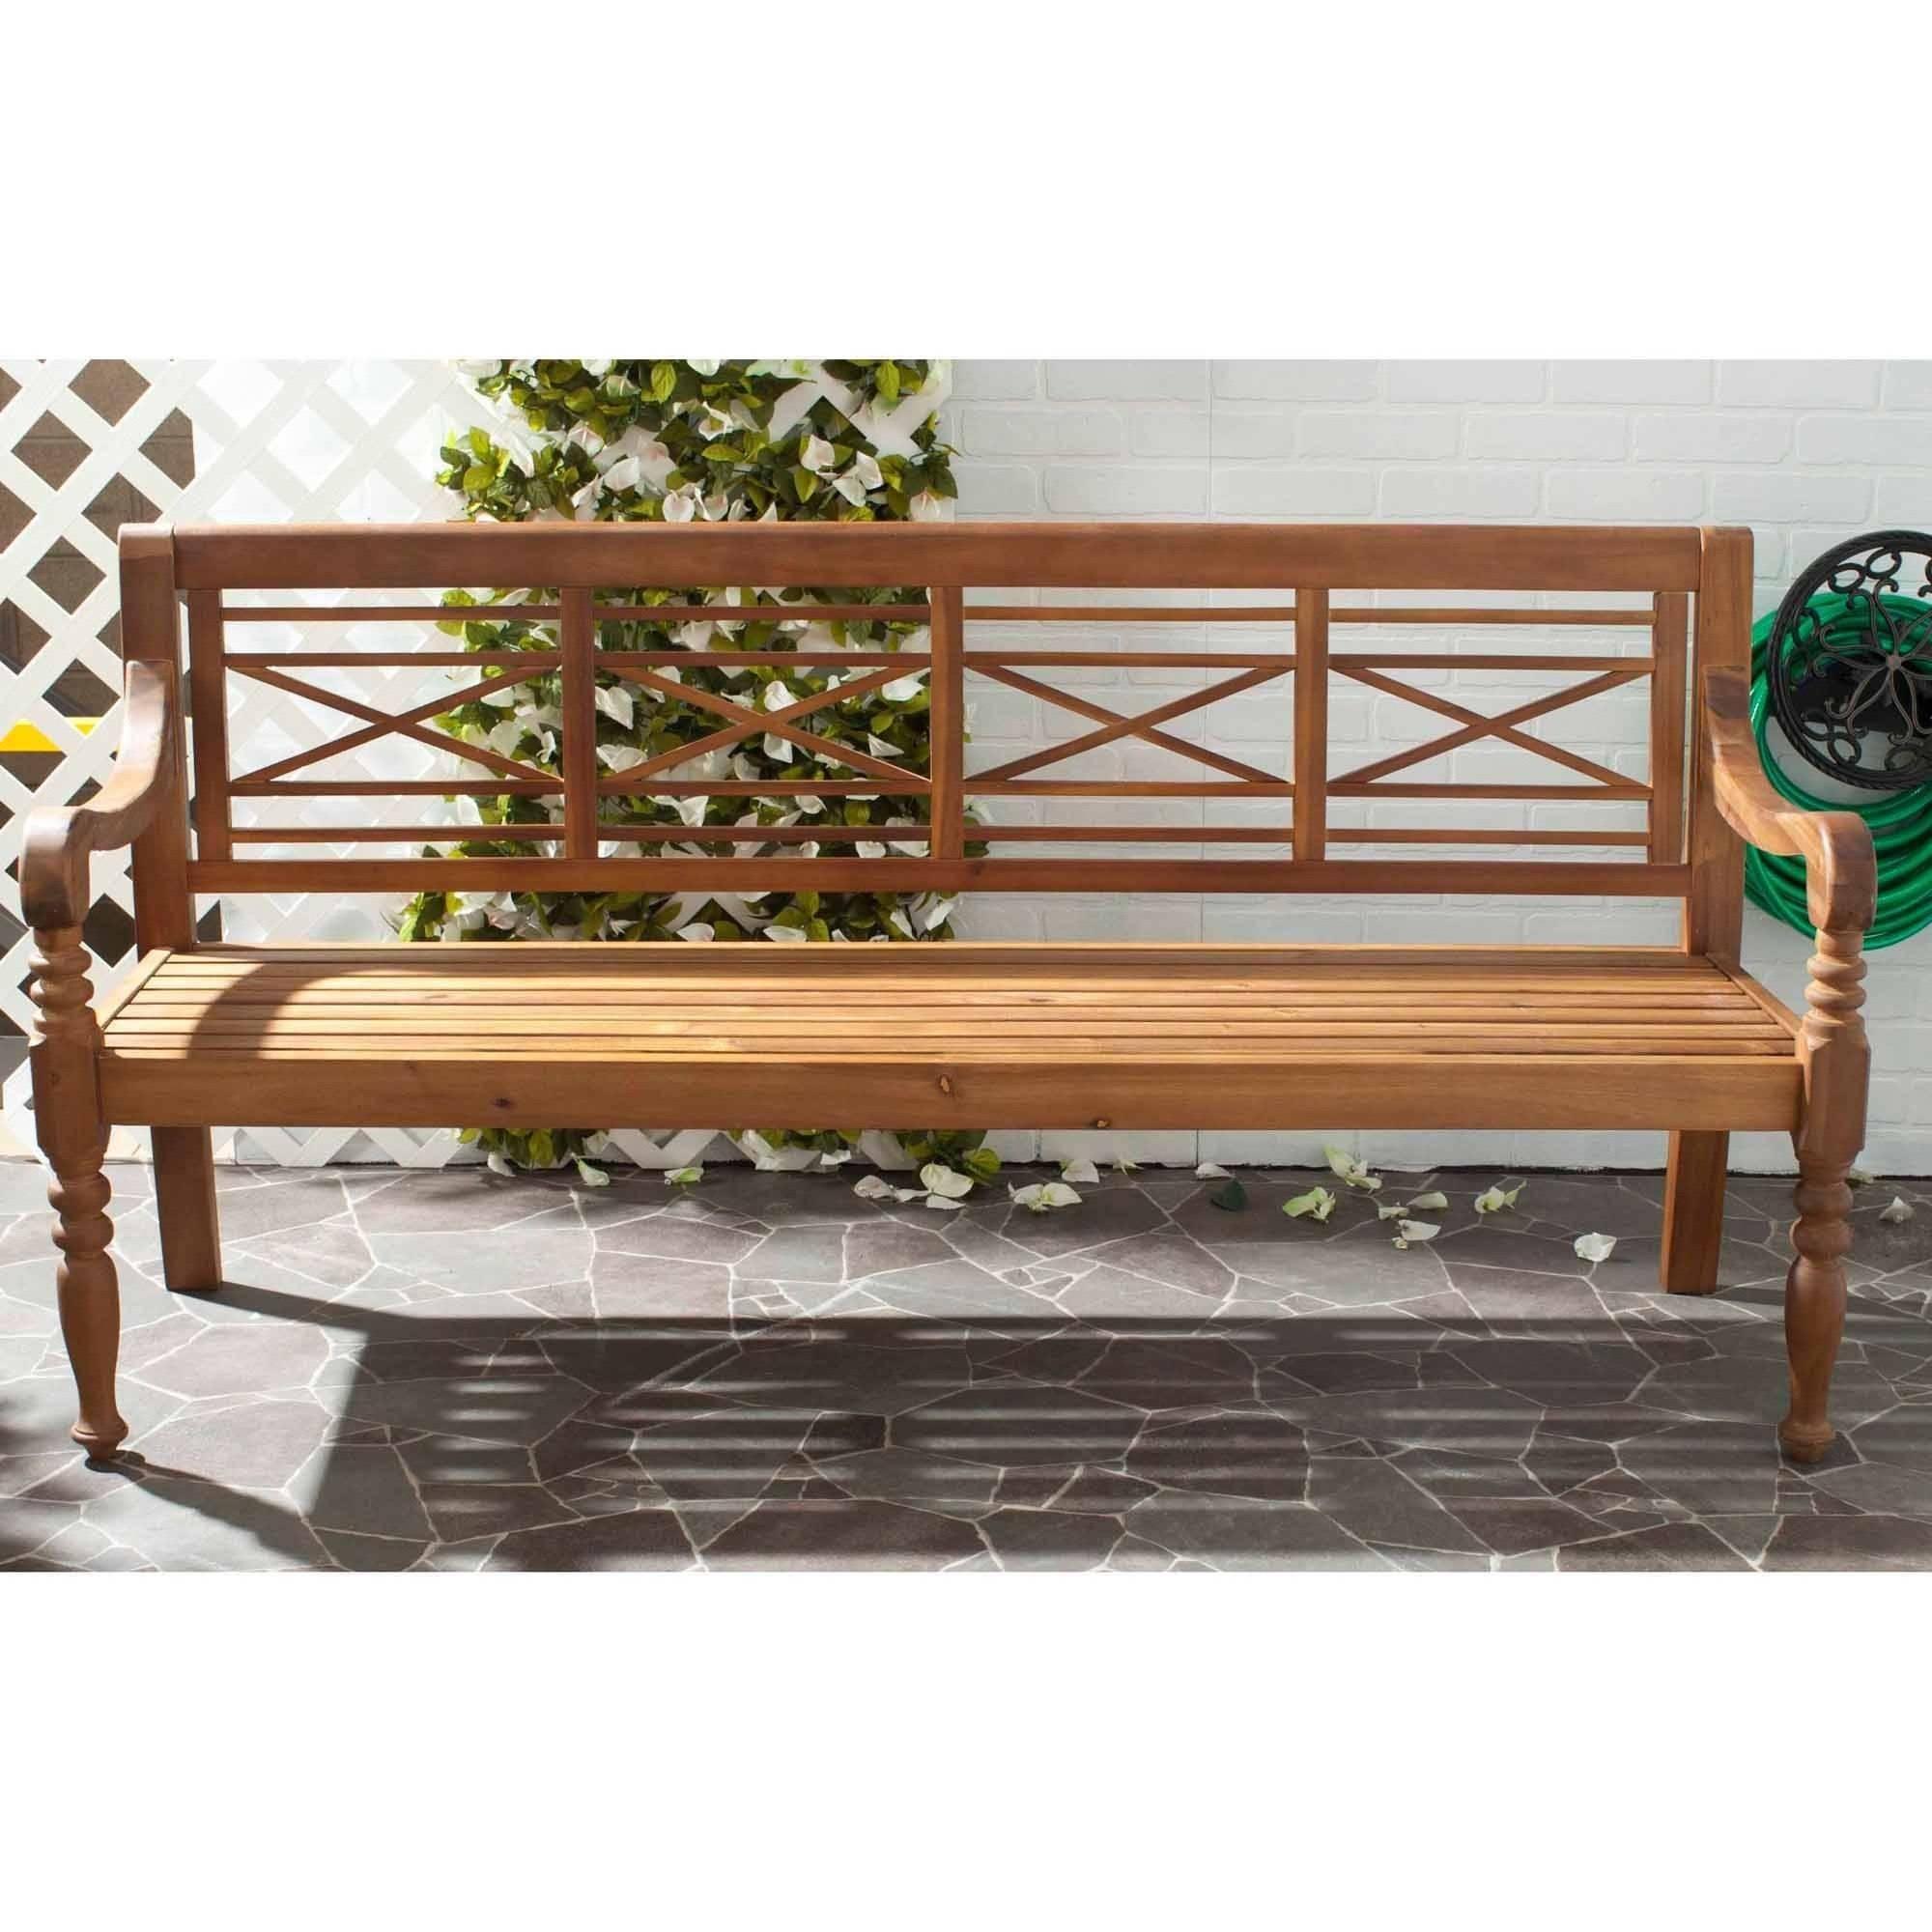 Safavieh Karoo Outdoor Bench